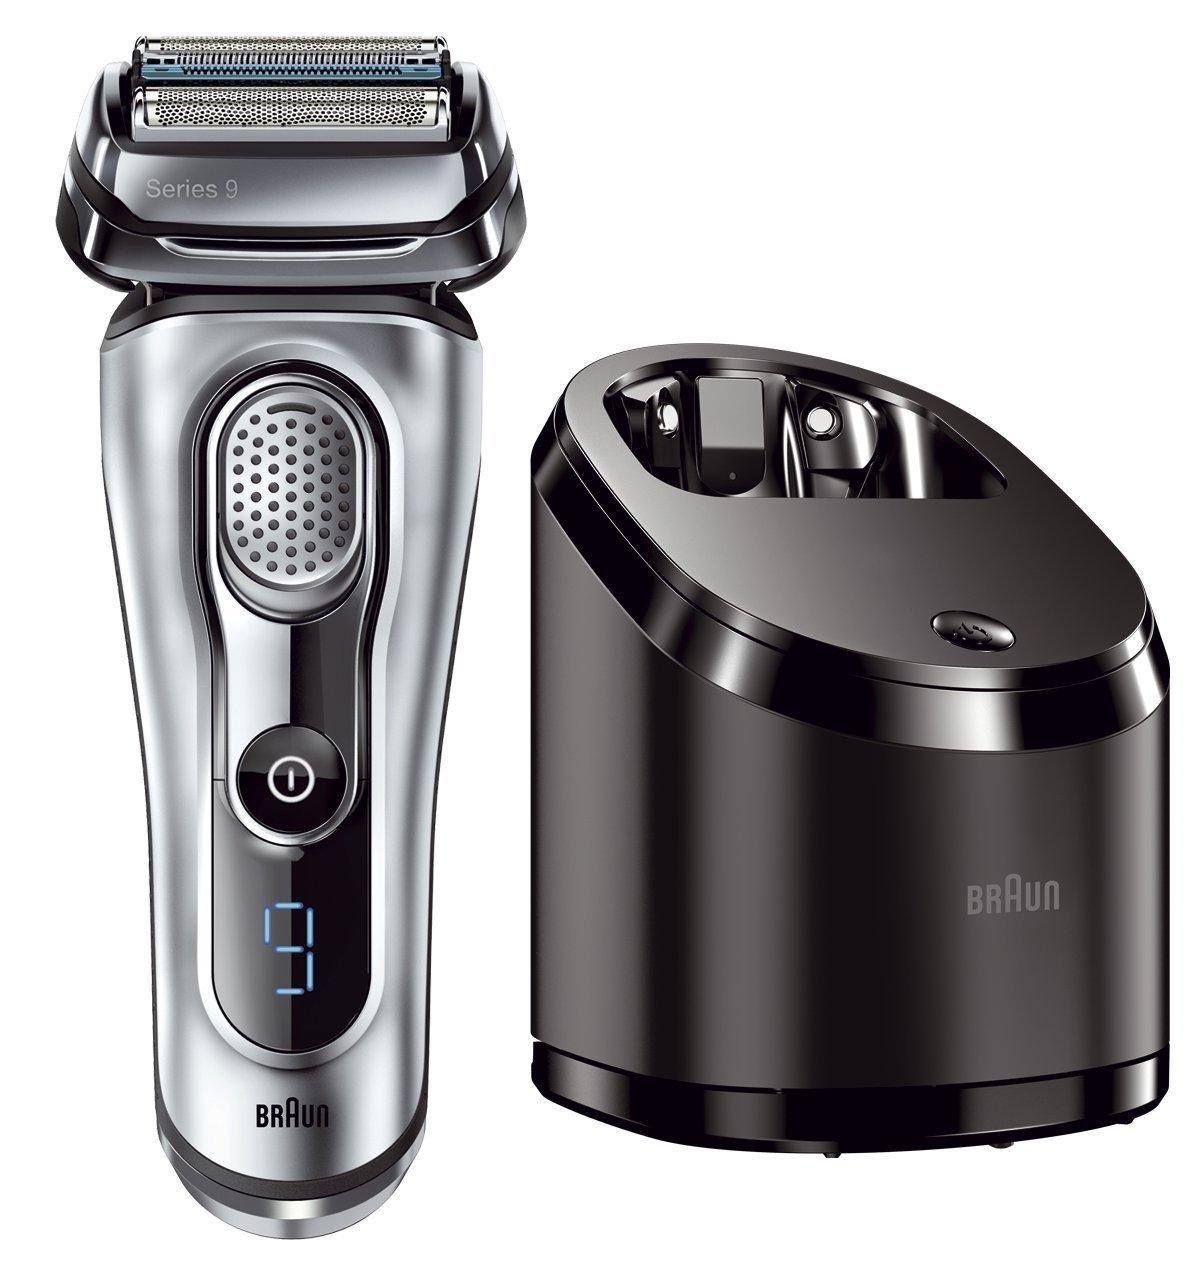 Braun Series 9 9090cc Rasoio Elettrico Barba a Lamina con Sistema Clean&Charge, Argento Satinato